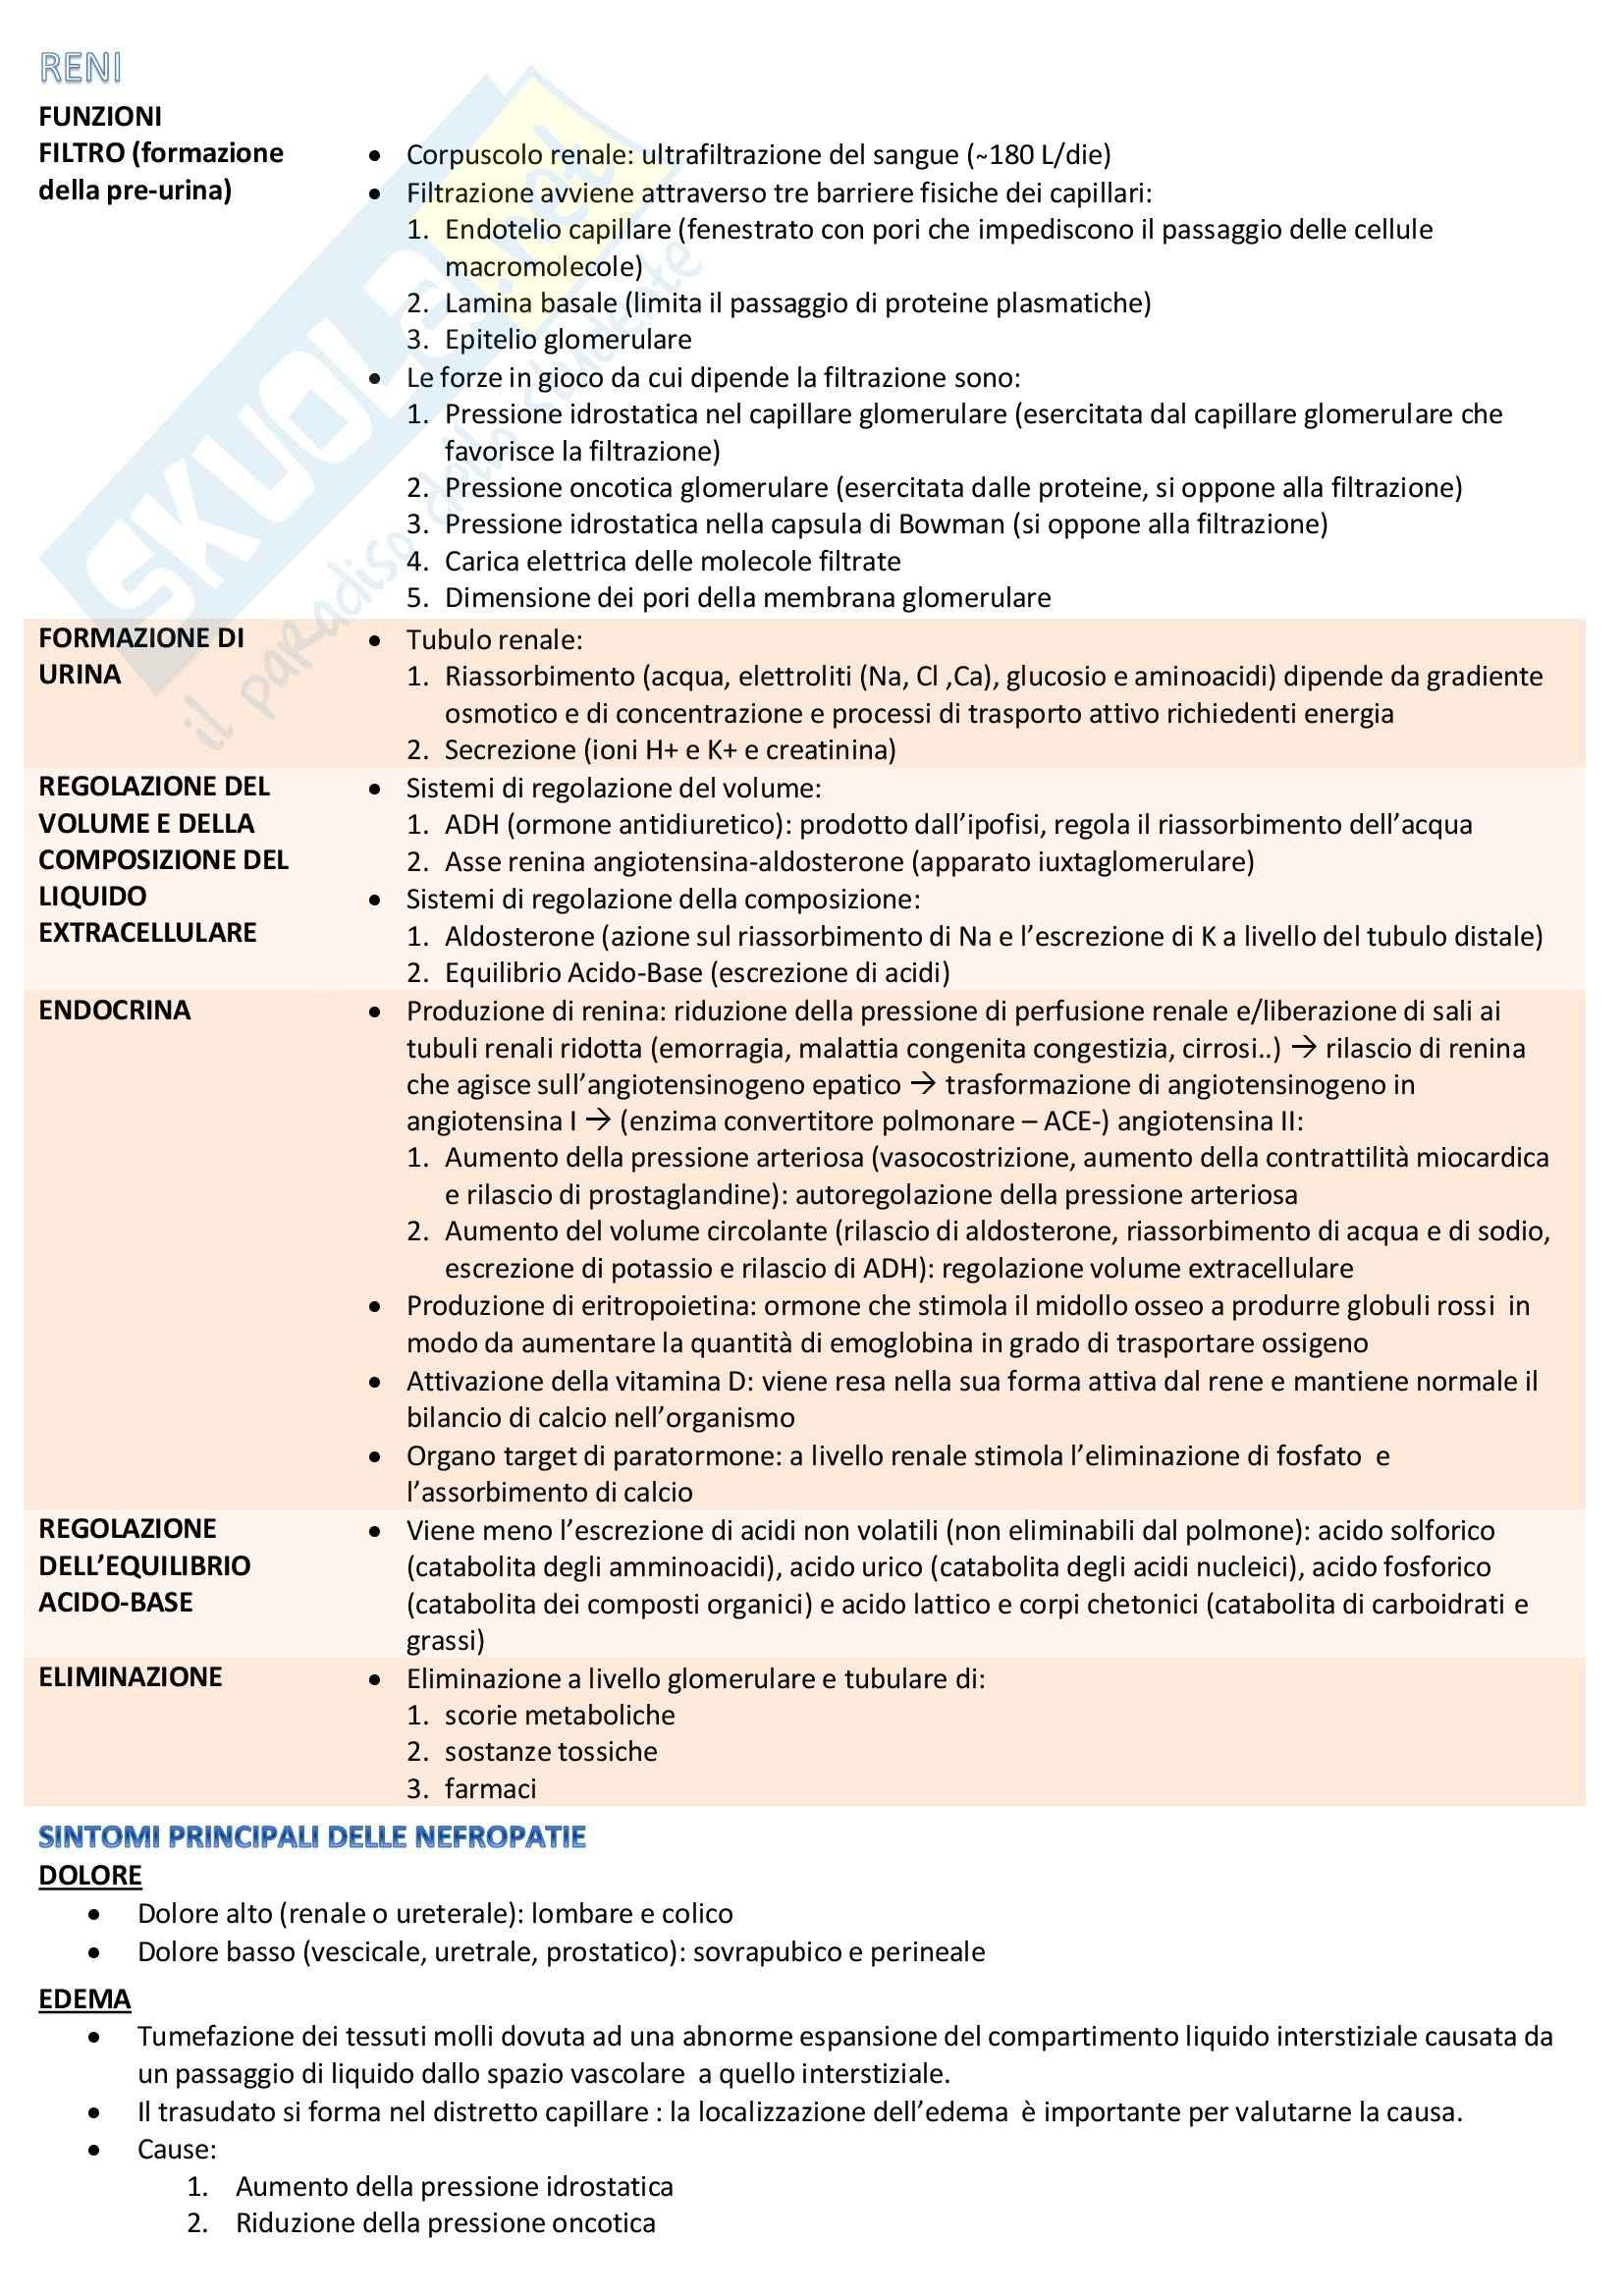 Riassunto esame Metodologia clinica infermieristica 1, prof. Genovesi